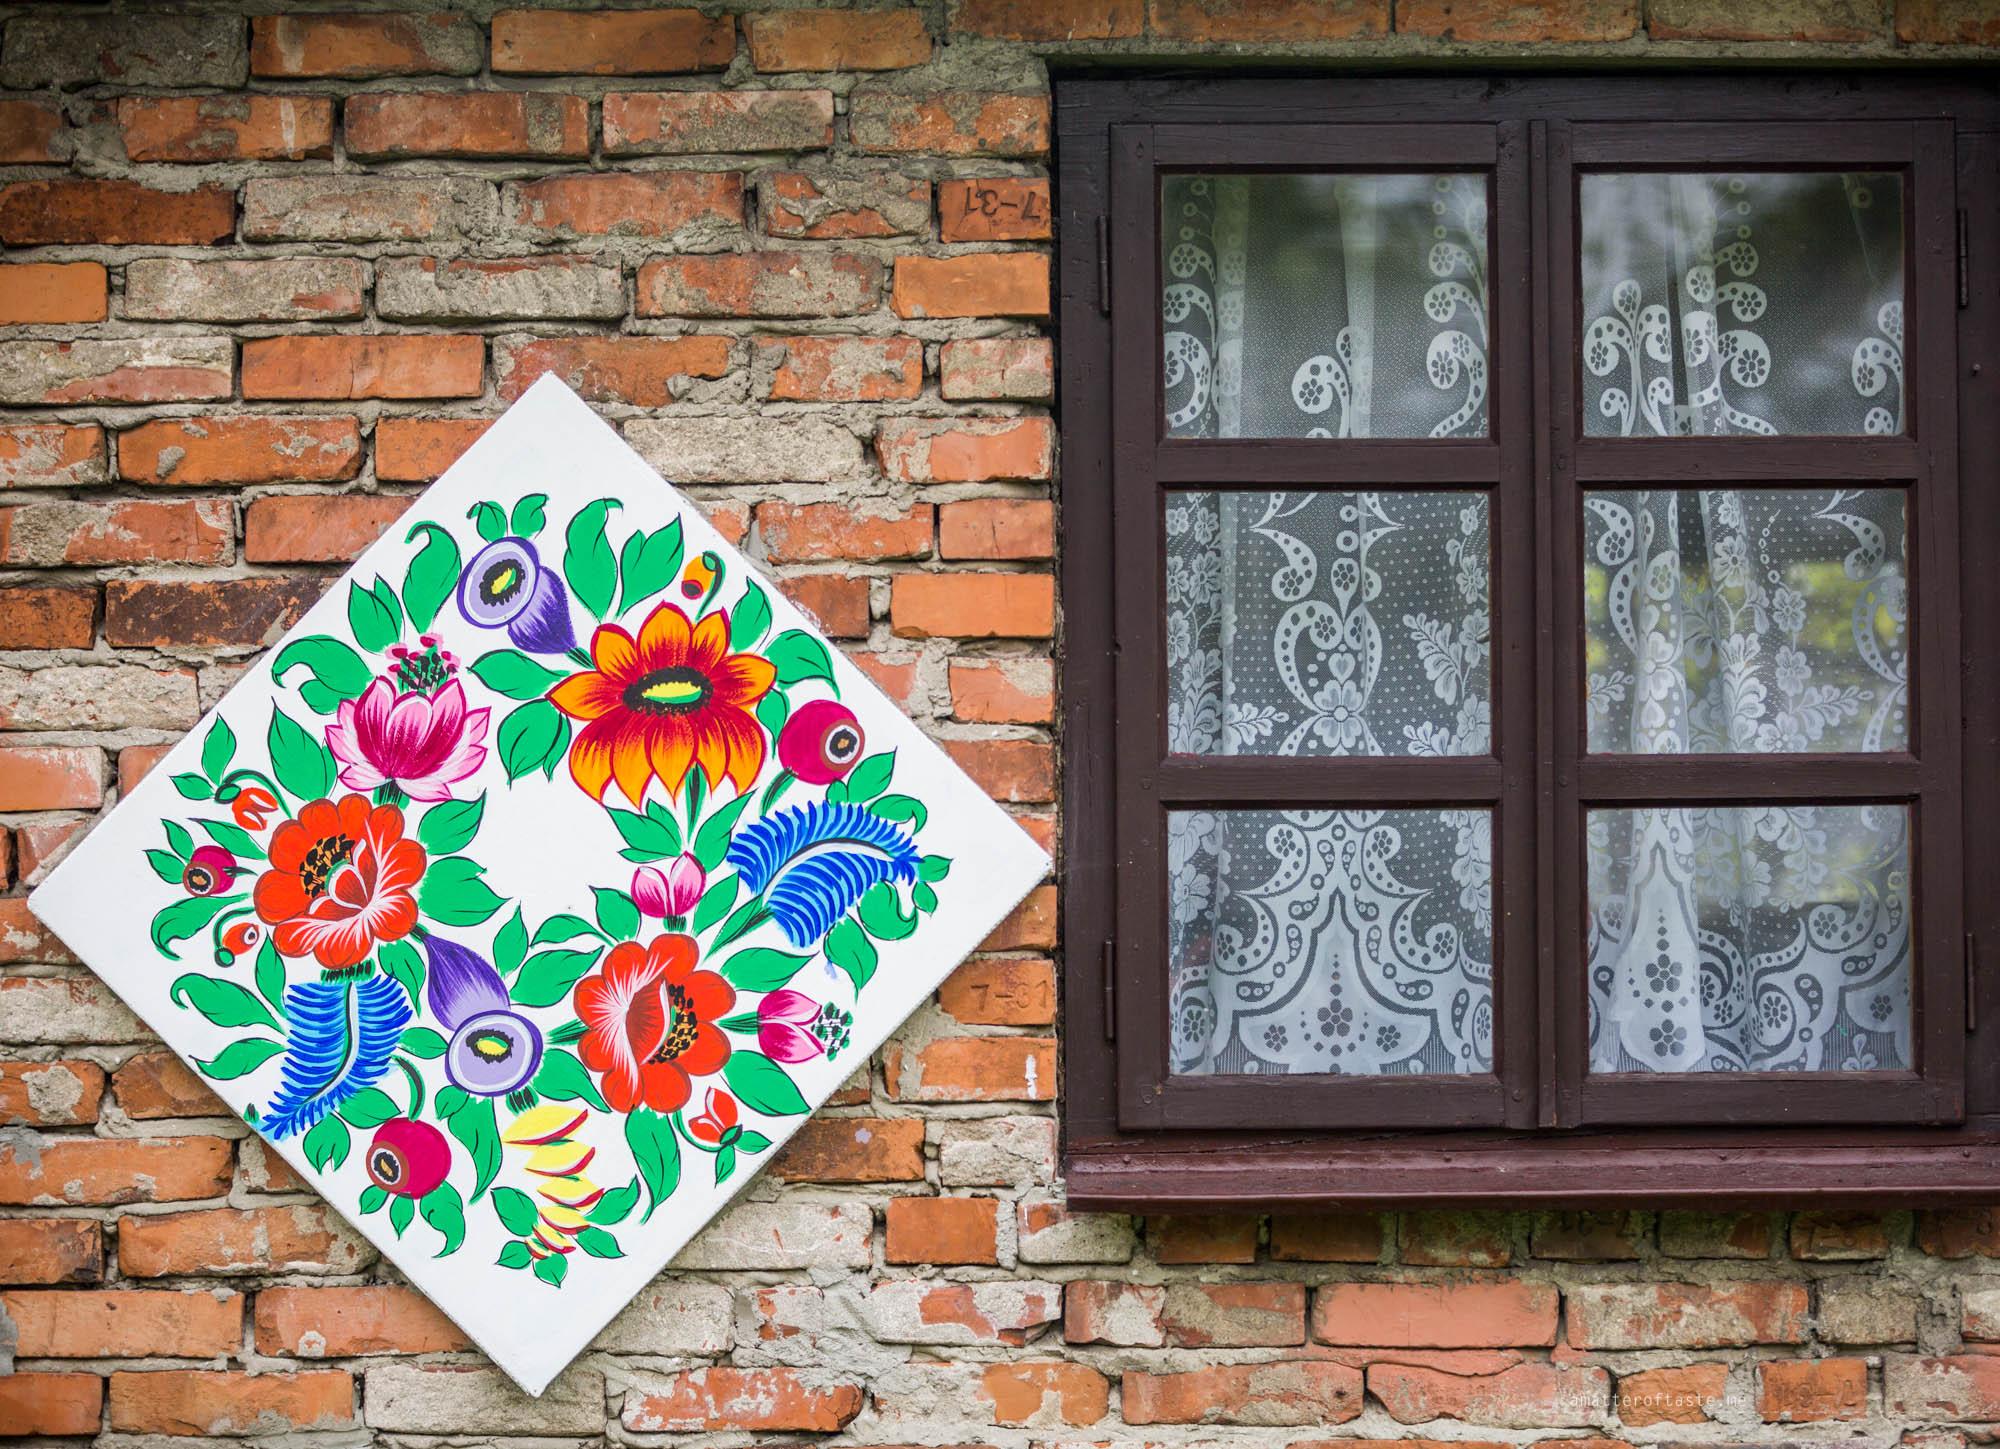 Zalipie-the most colourful village in Poland -5